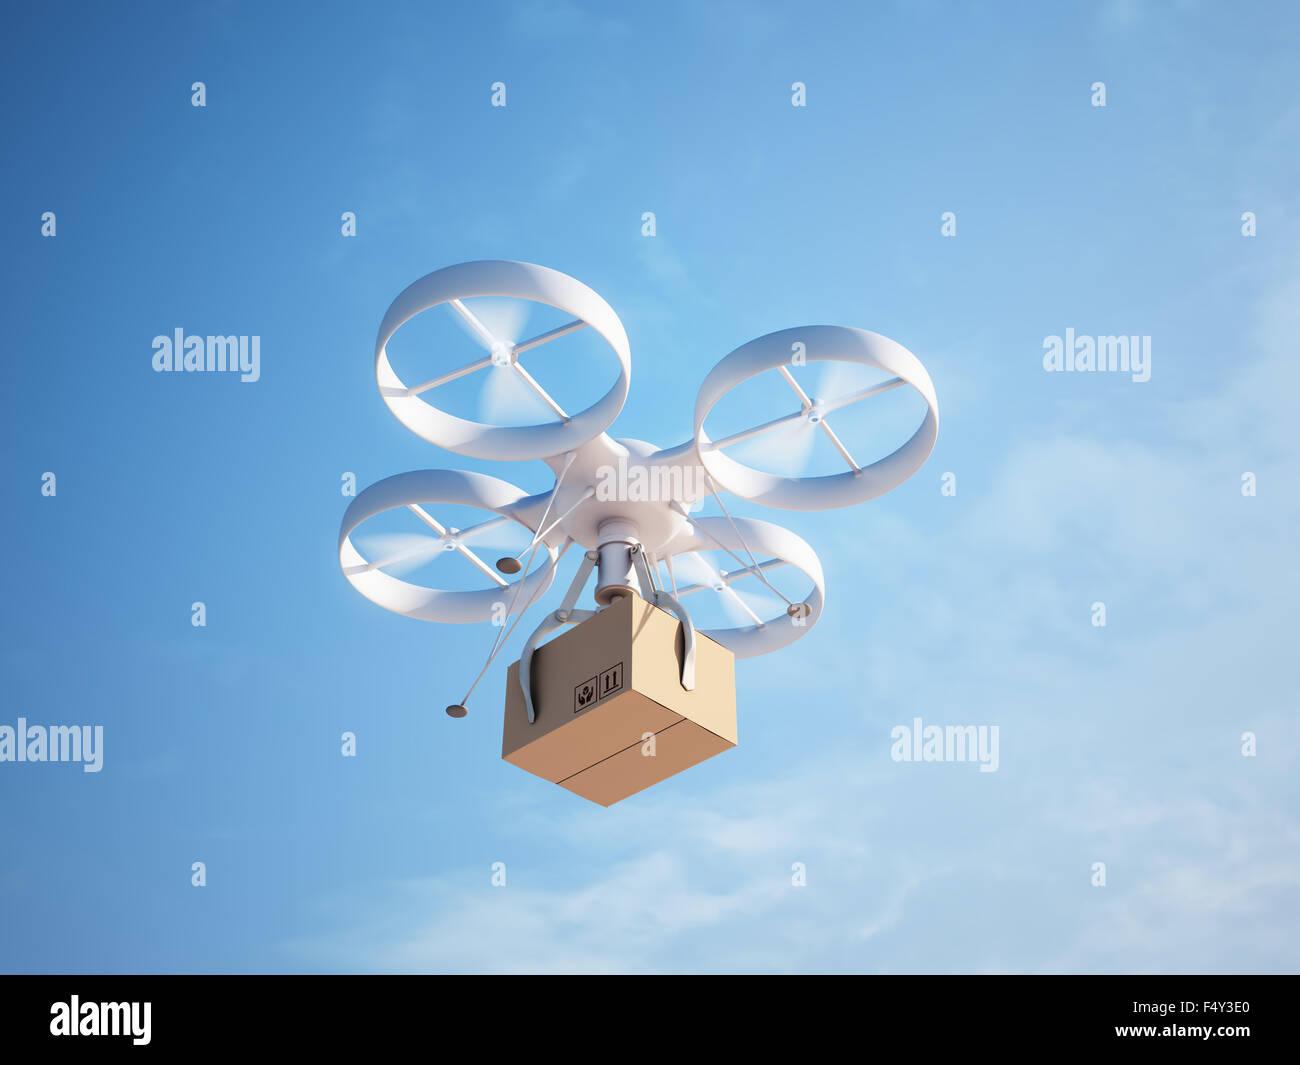 Drohne liefern eine Paket - autonome Logistik Stockbild